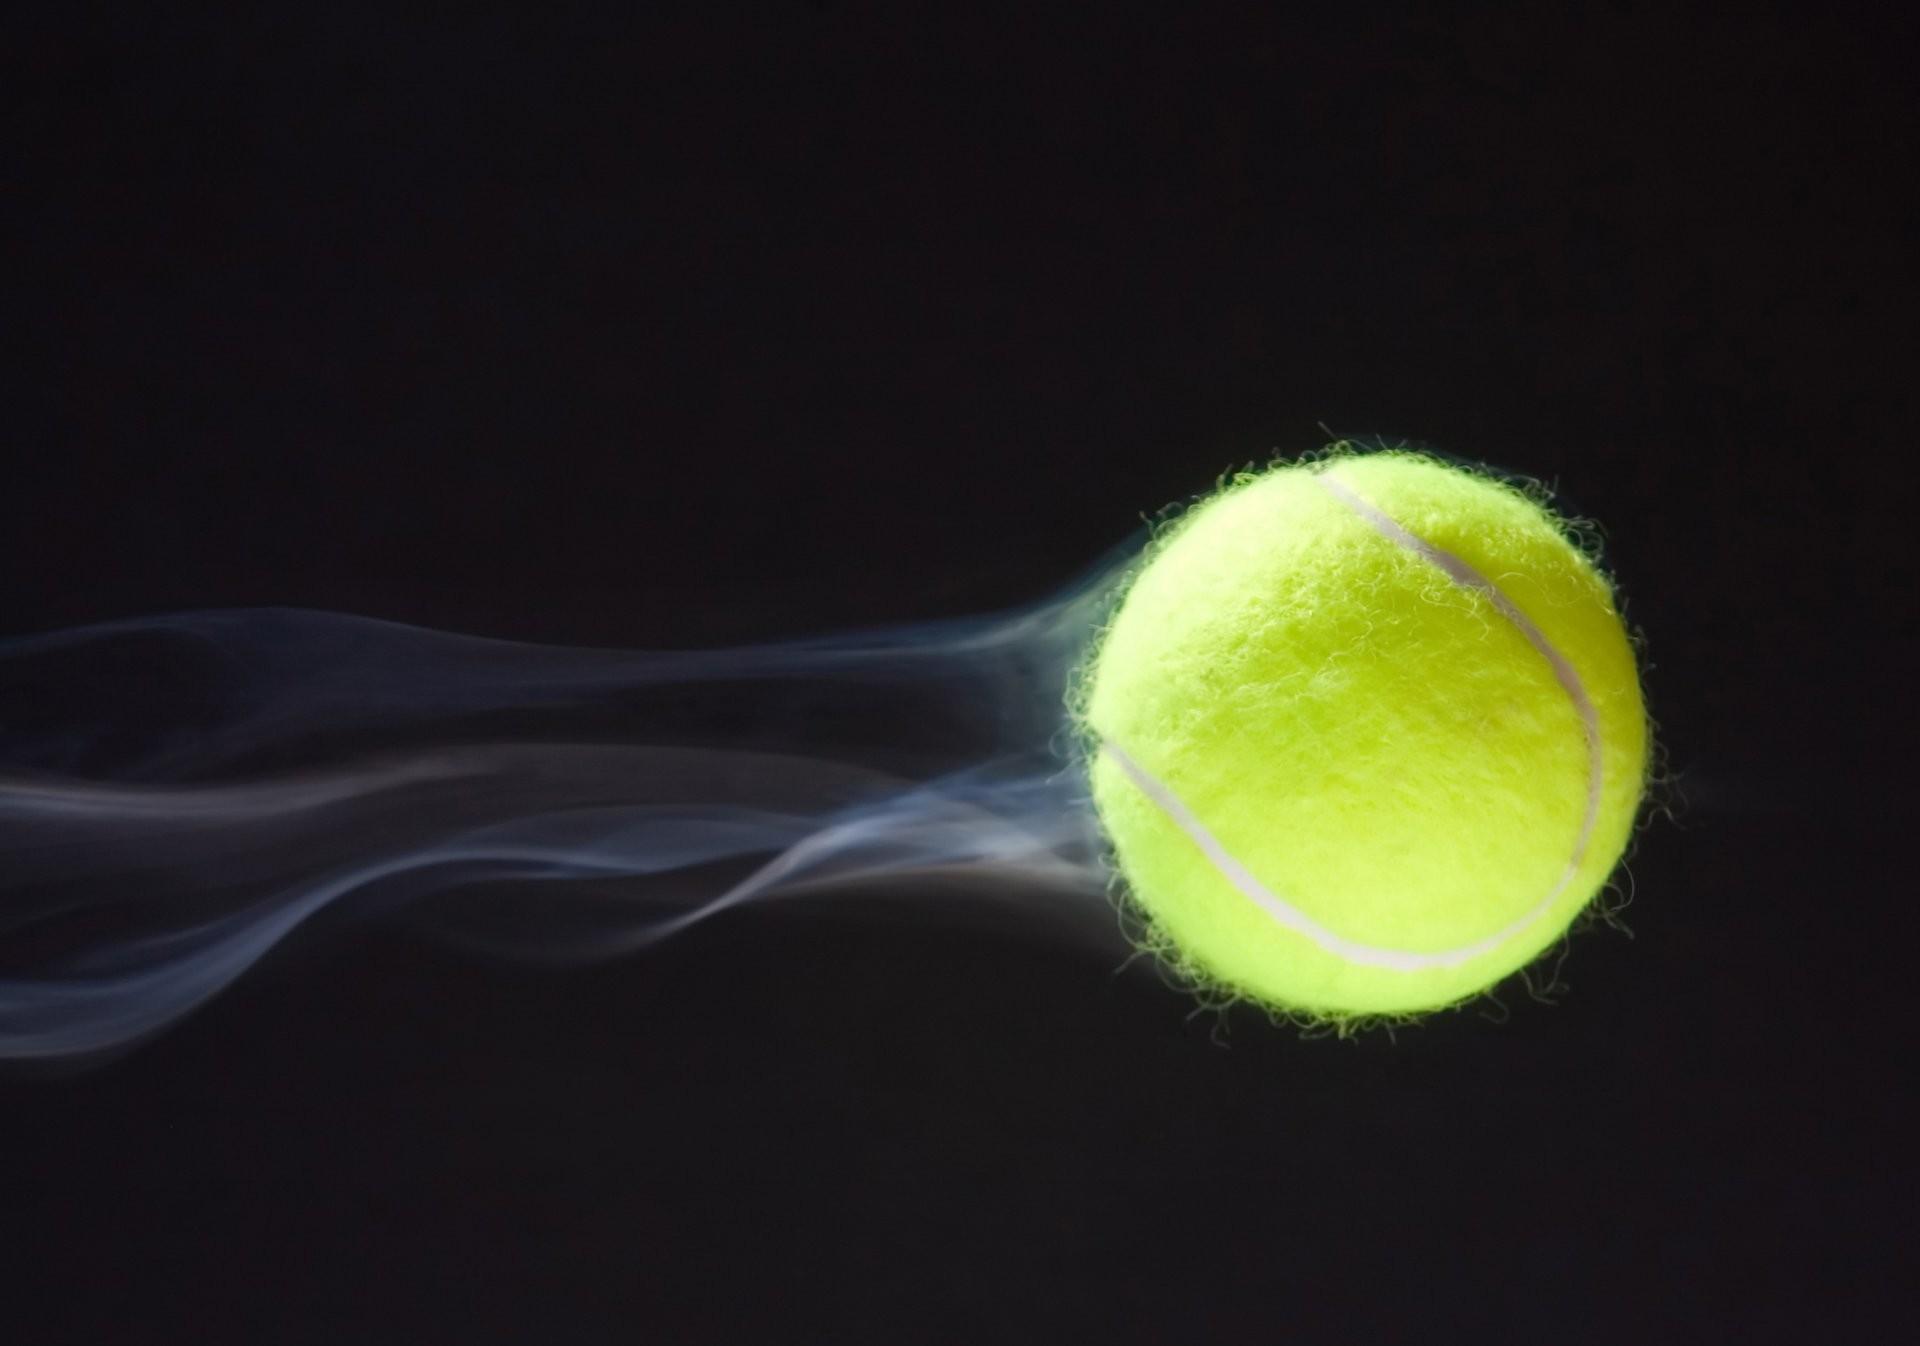 tennis ball tennis ball tennis tennis trajectory of the flight flex cable  speed dark blue background